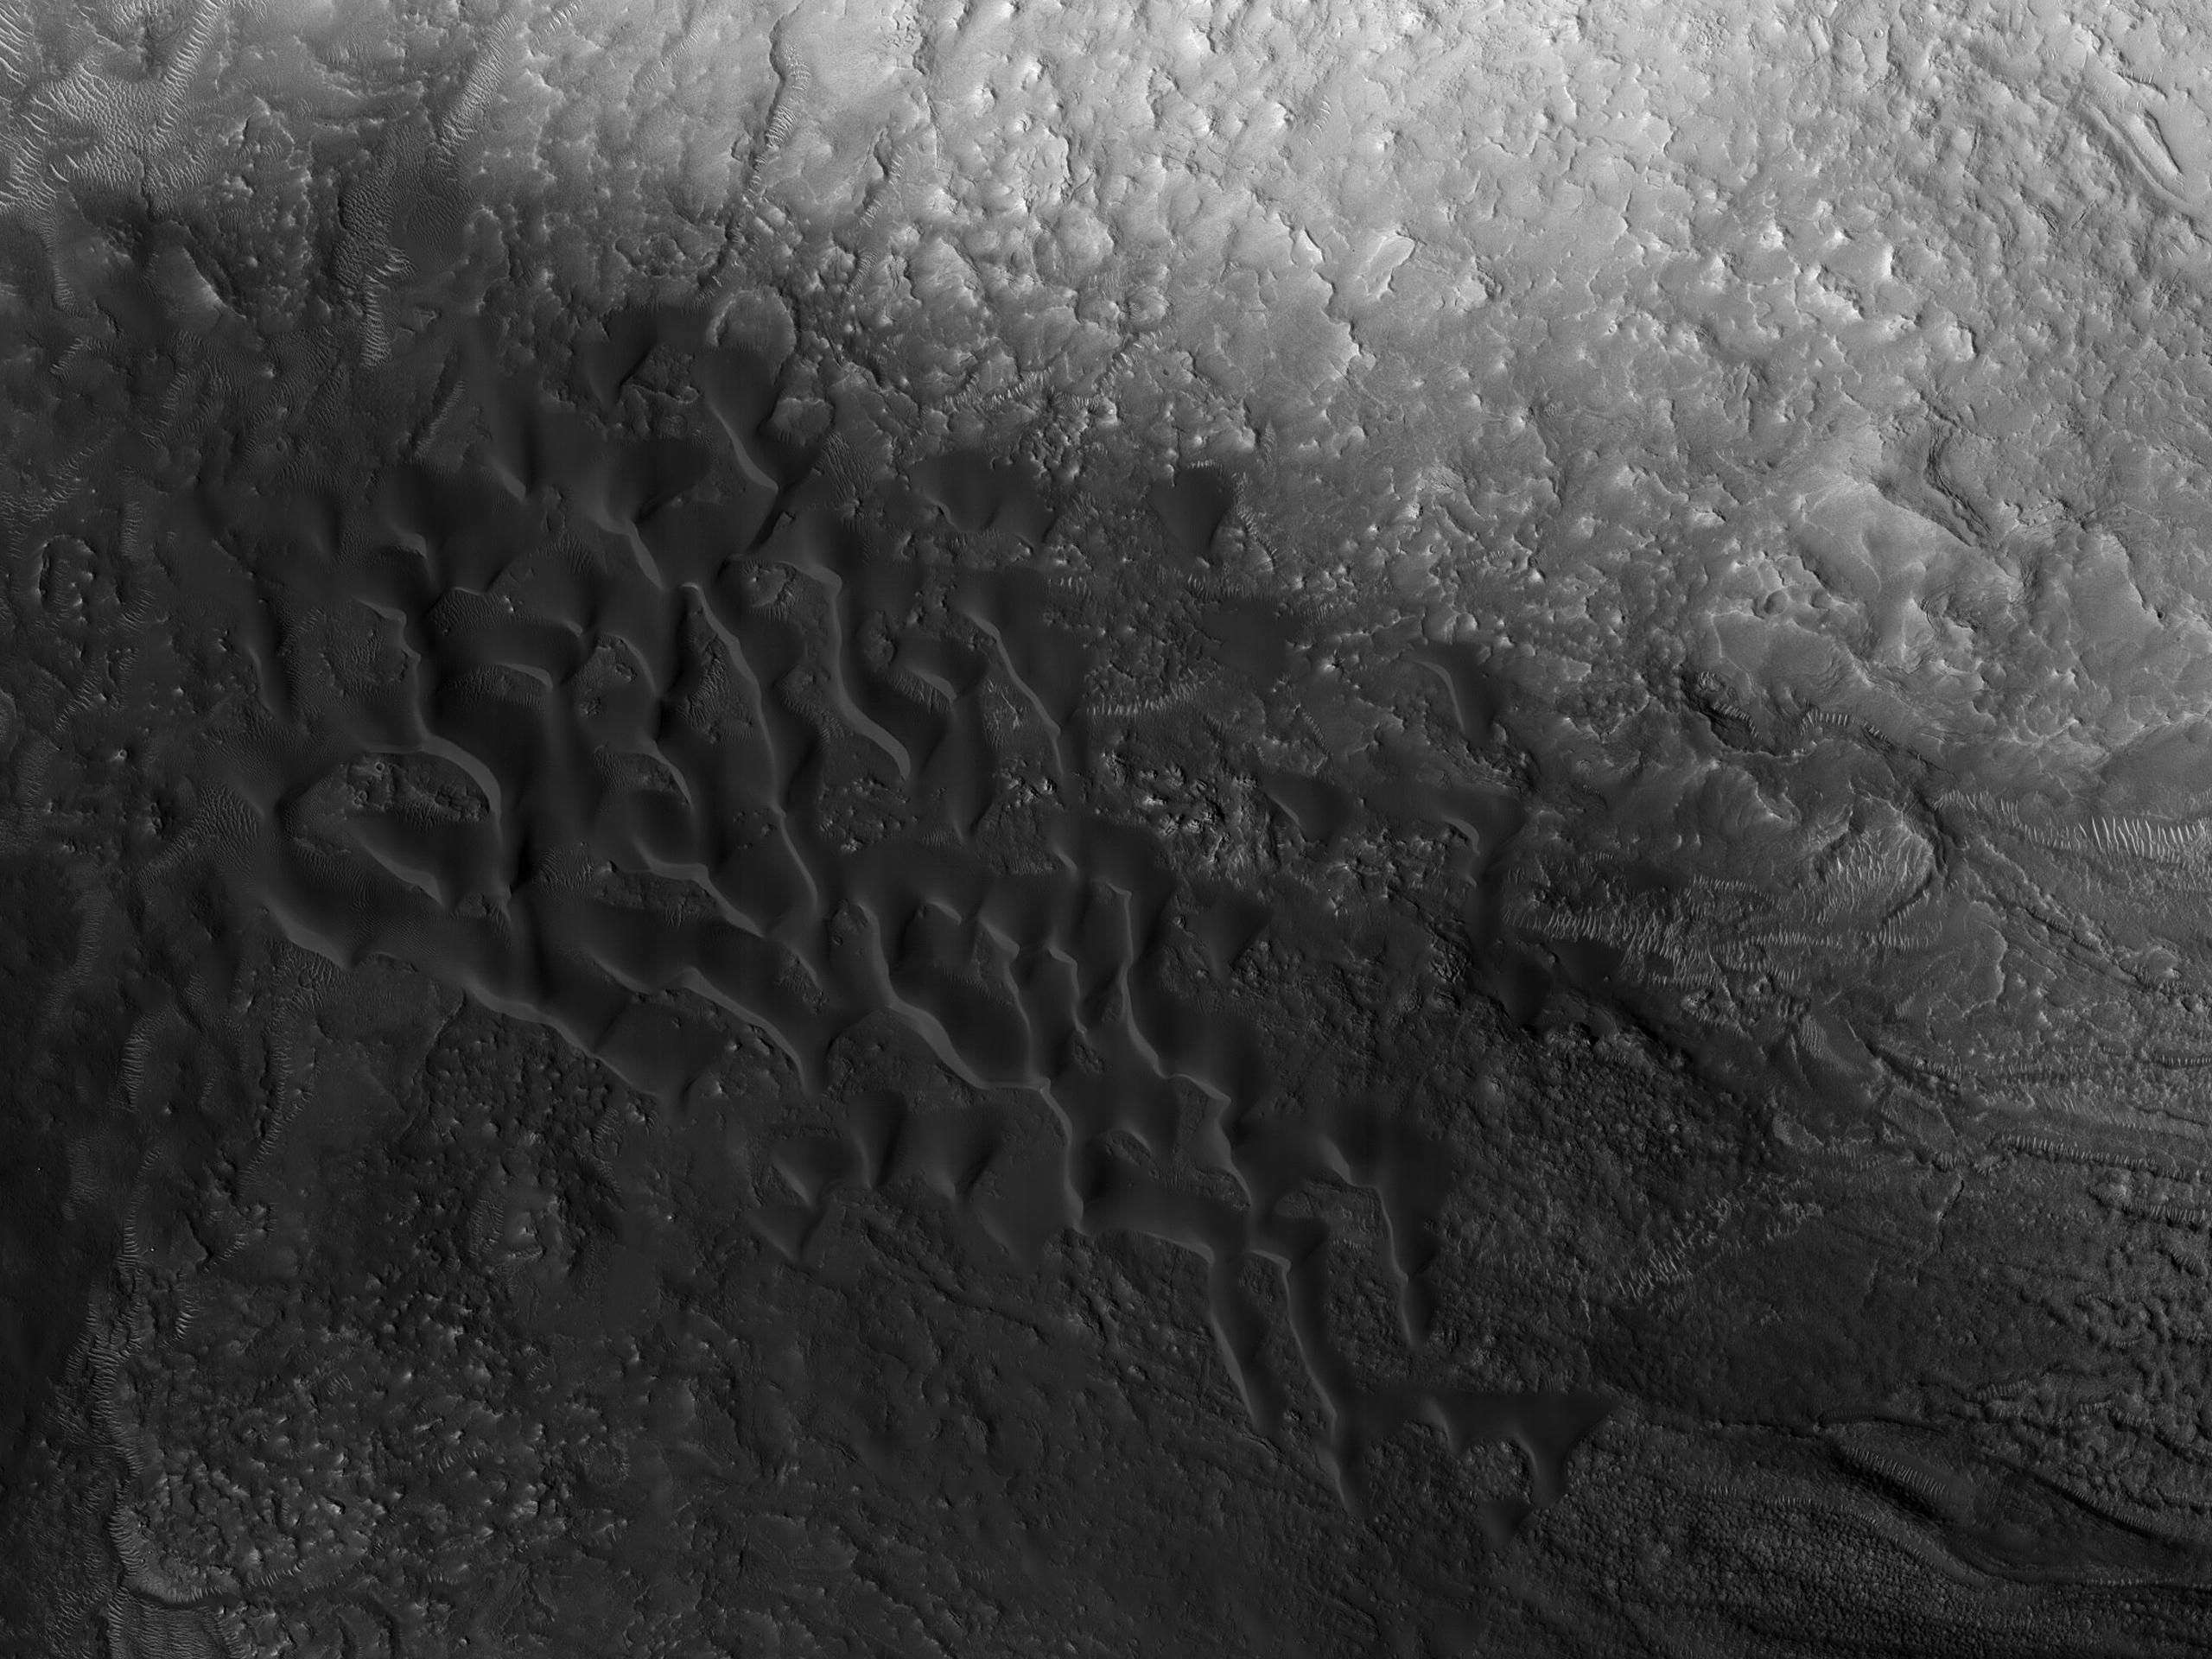 Nilosyrtis Mensae Dunes